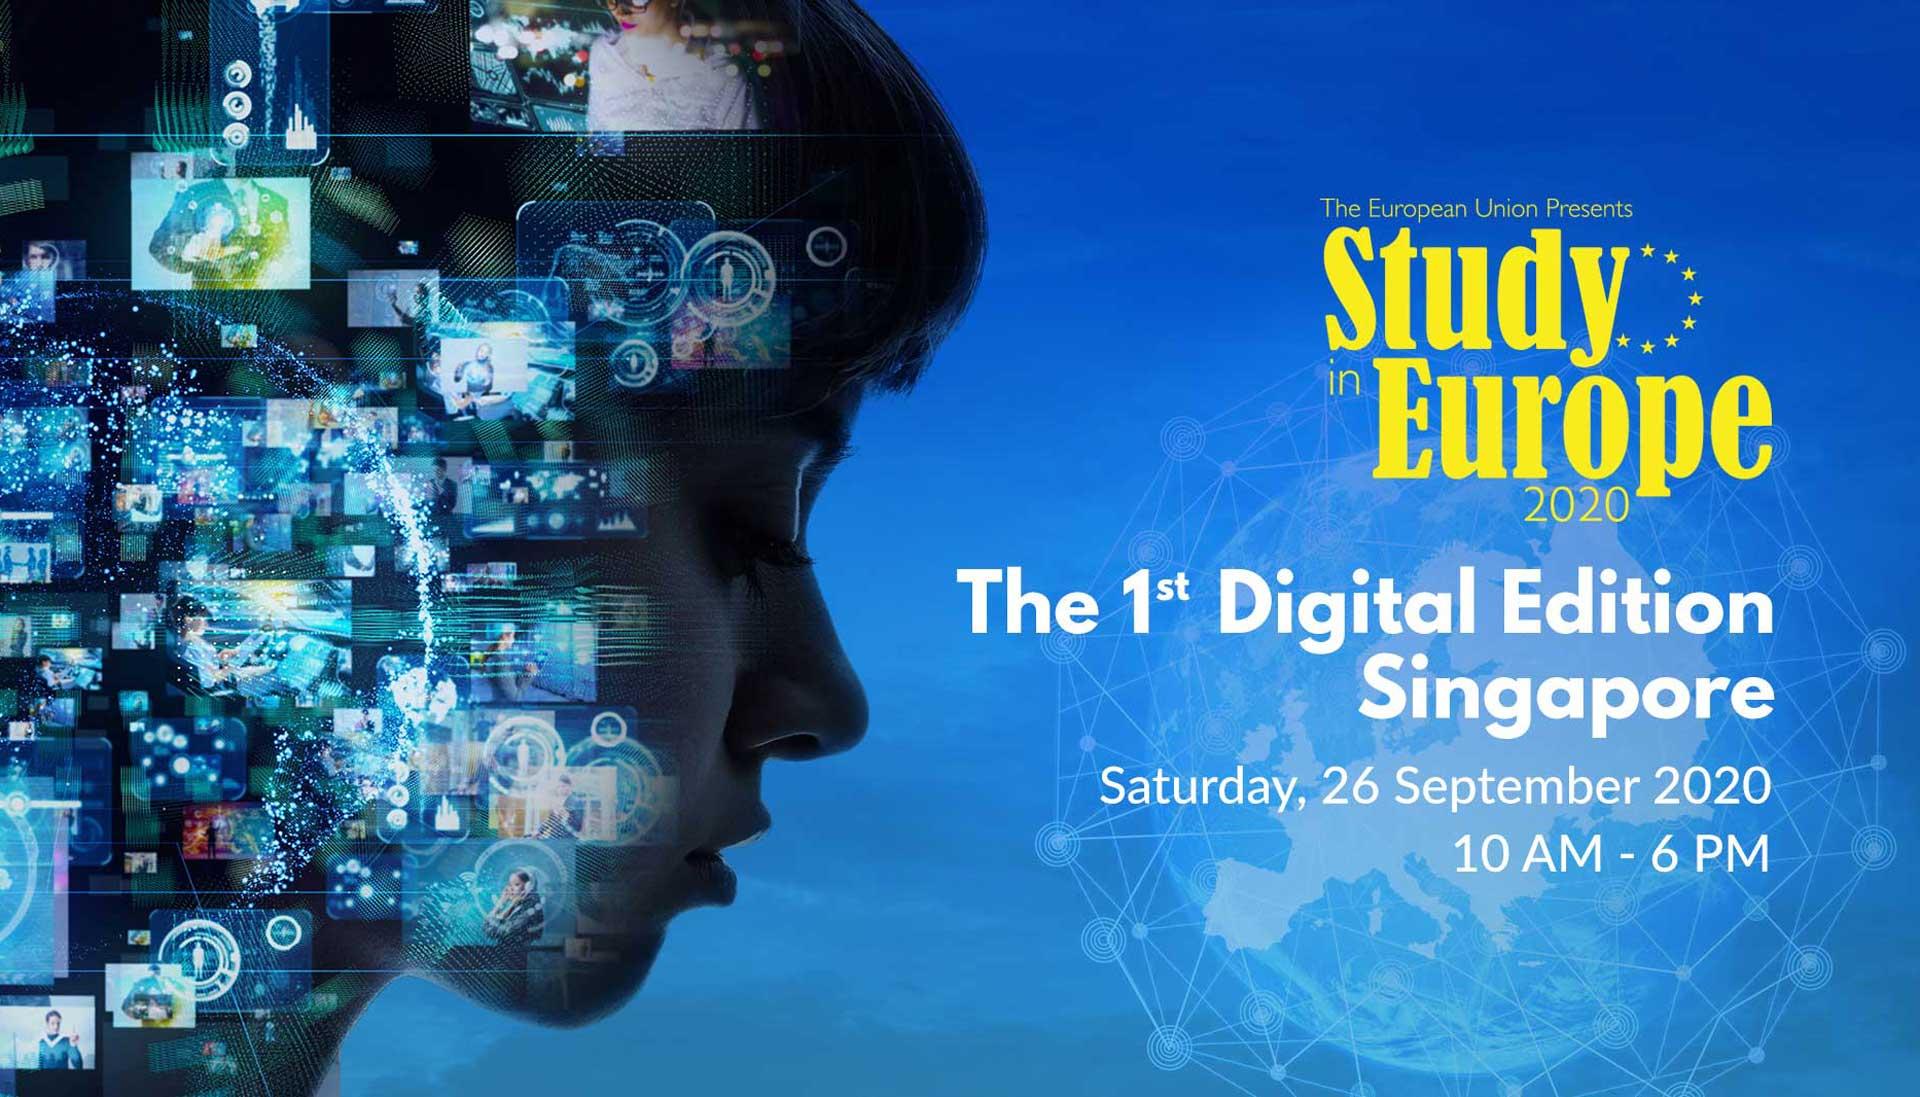 Study in Europe Polandshiok 2020 polish festival in Singapore | polandshiok.sg